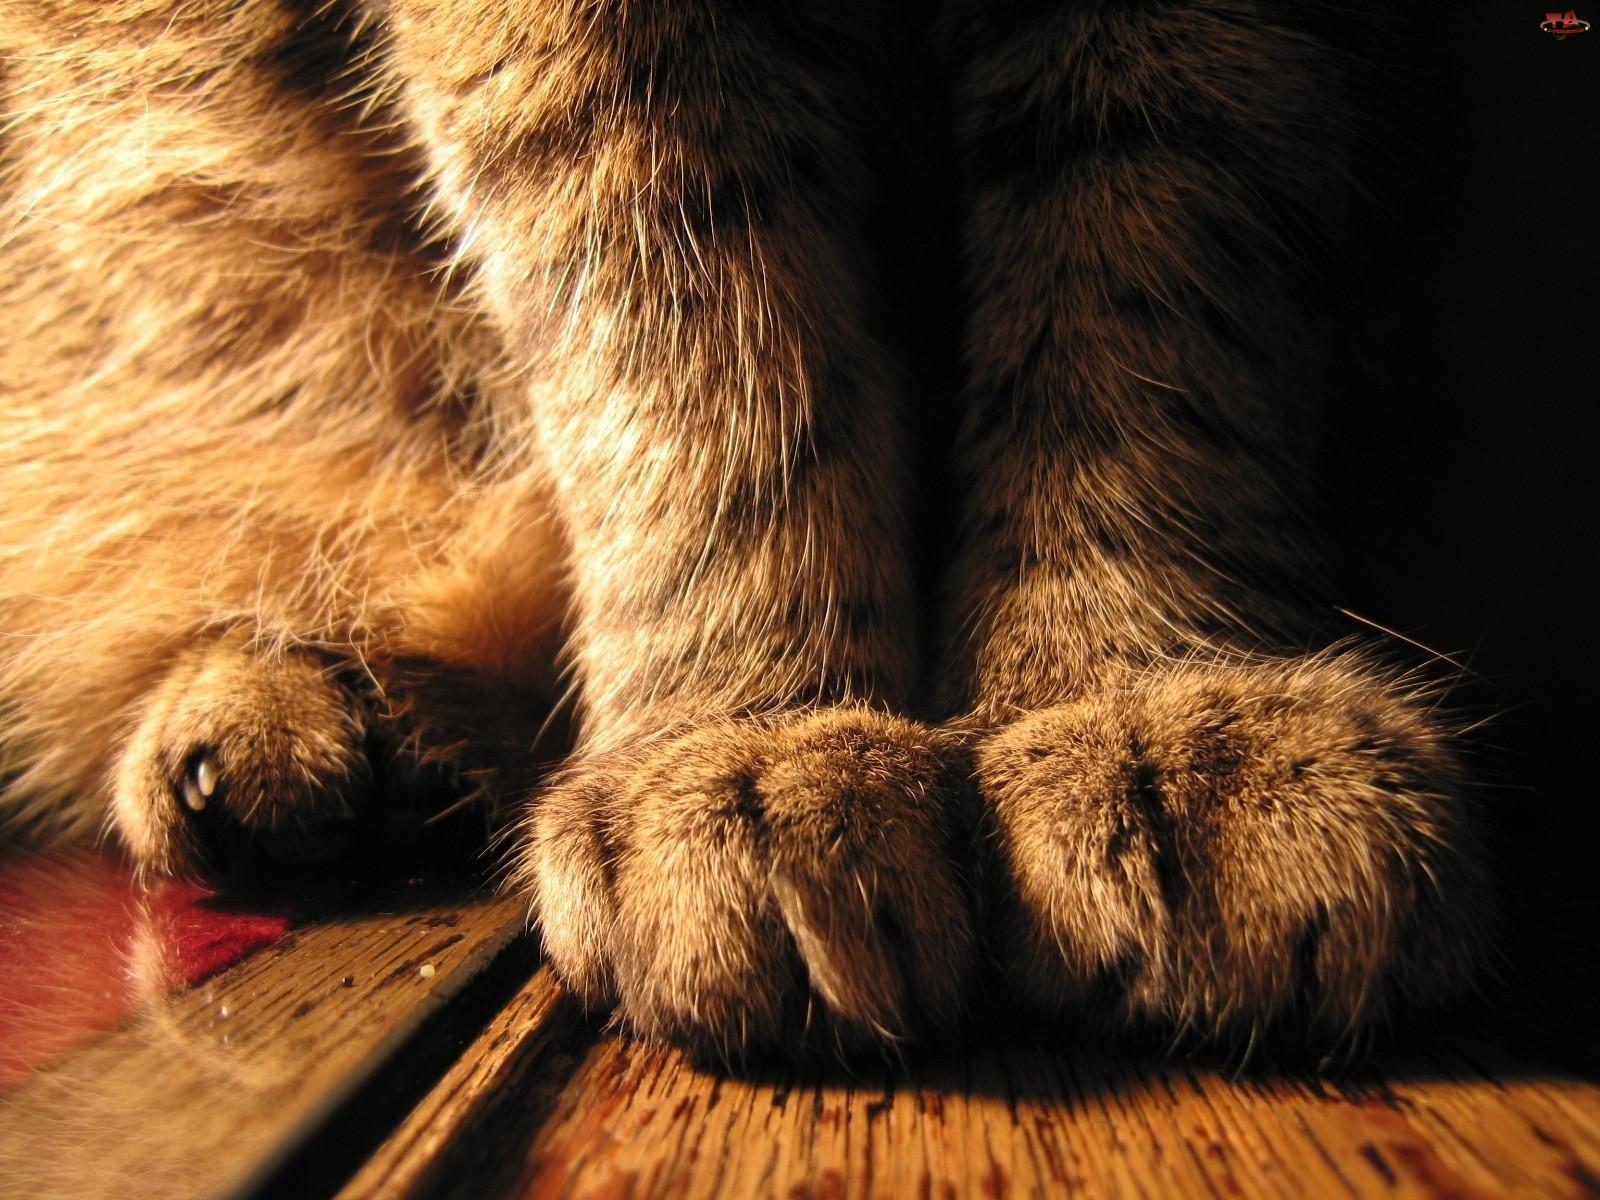 Kot, Podłoga, Łapy, Pazury